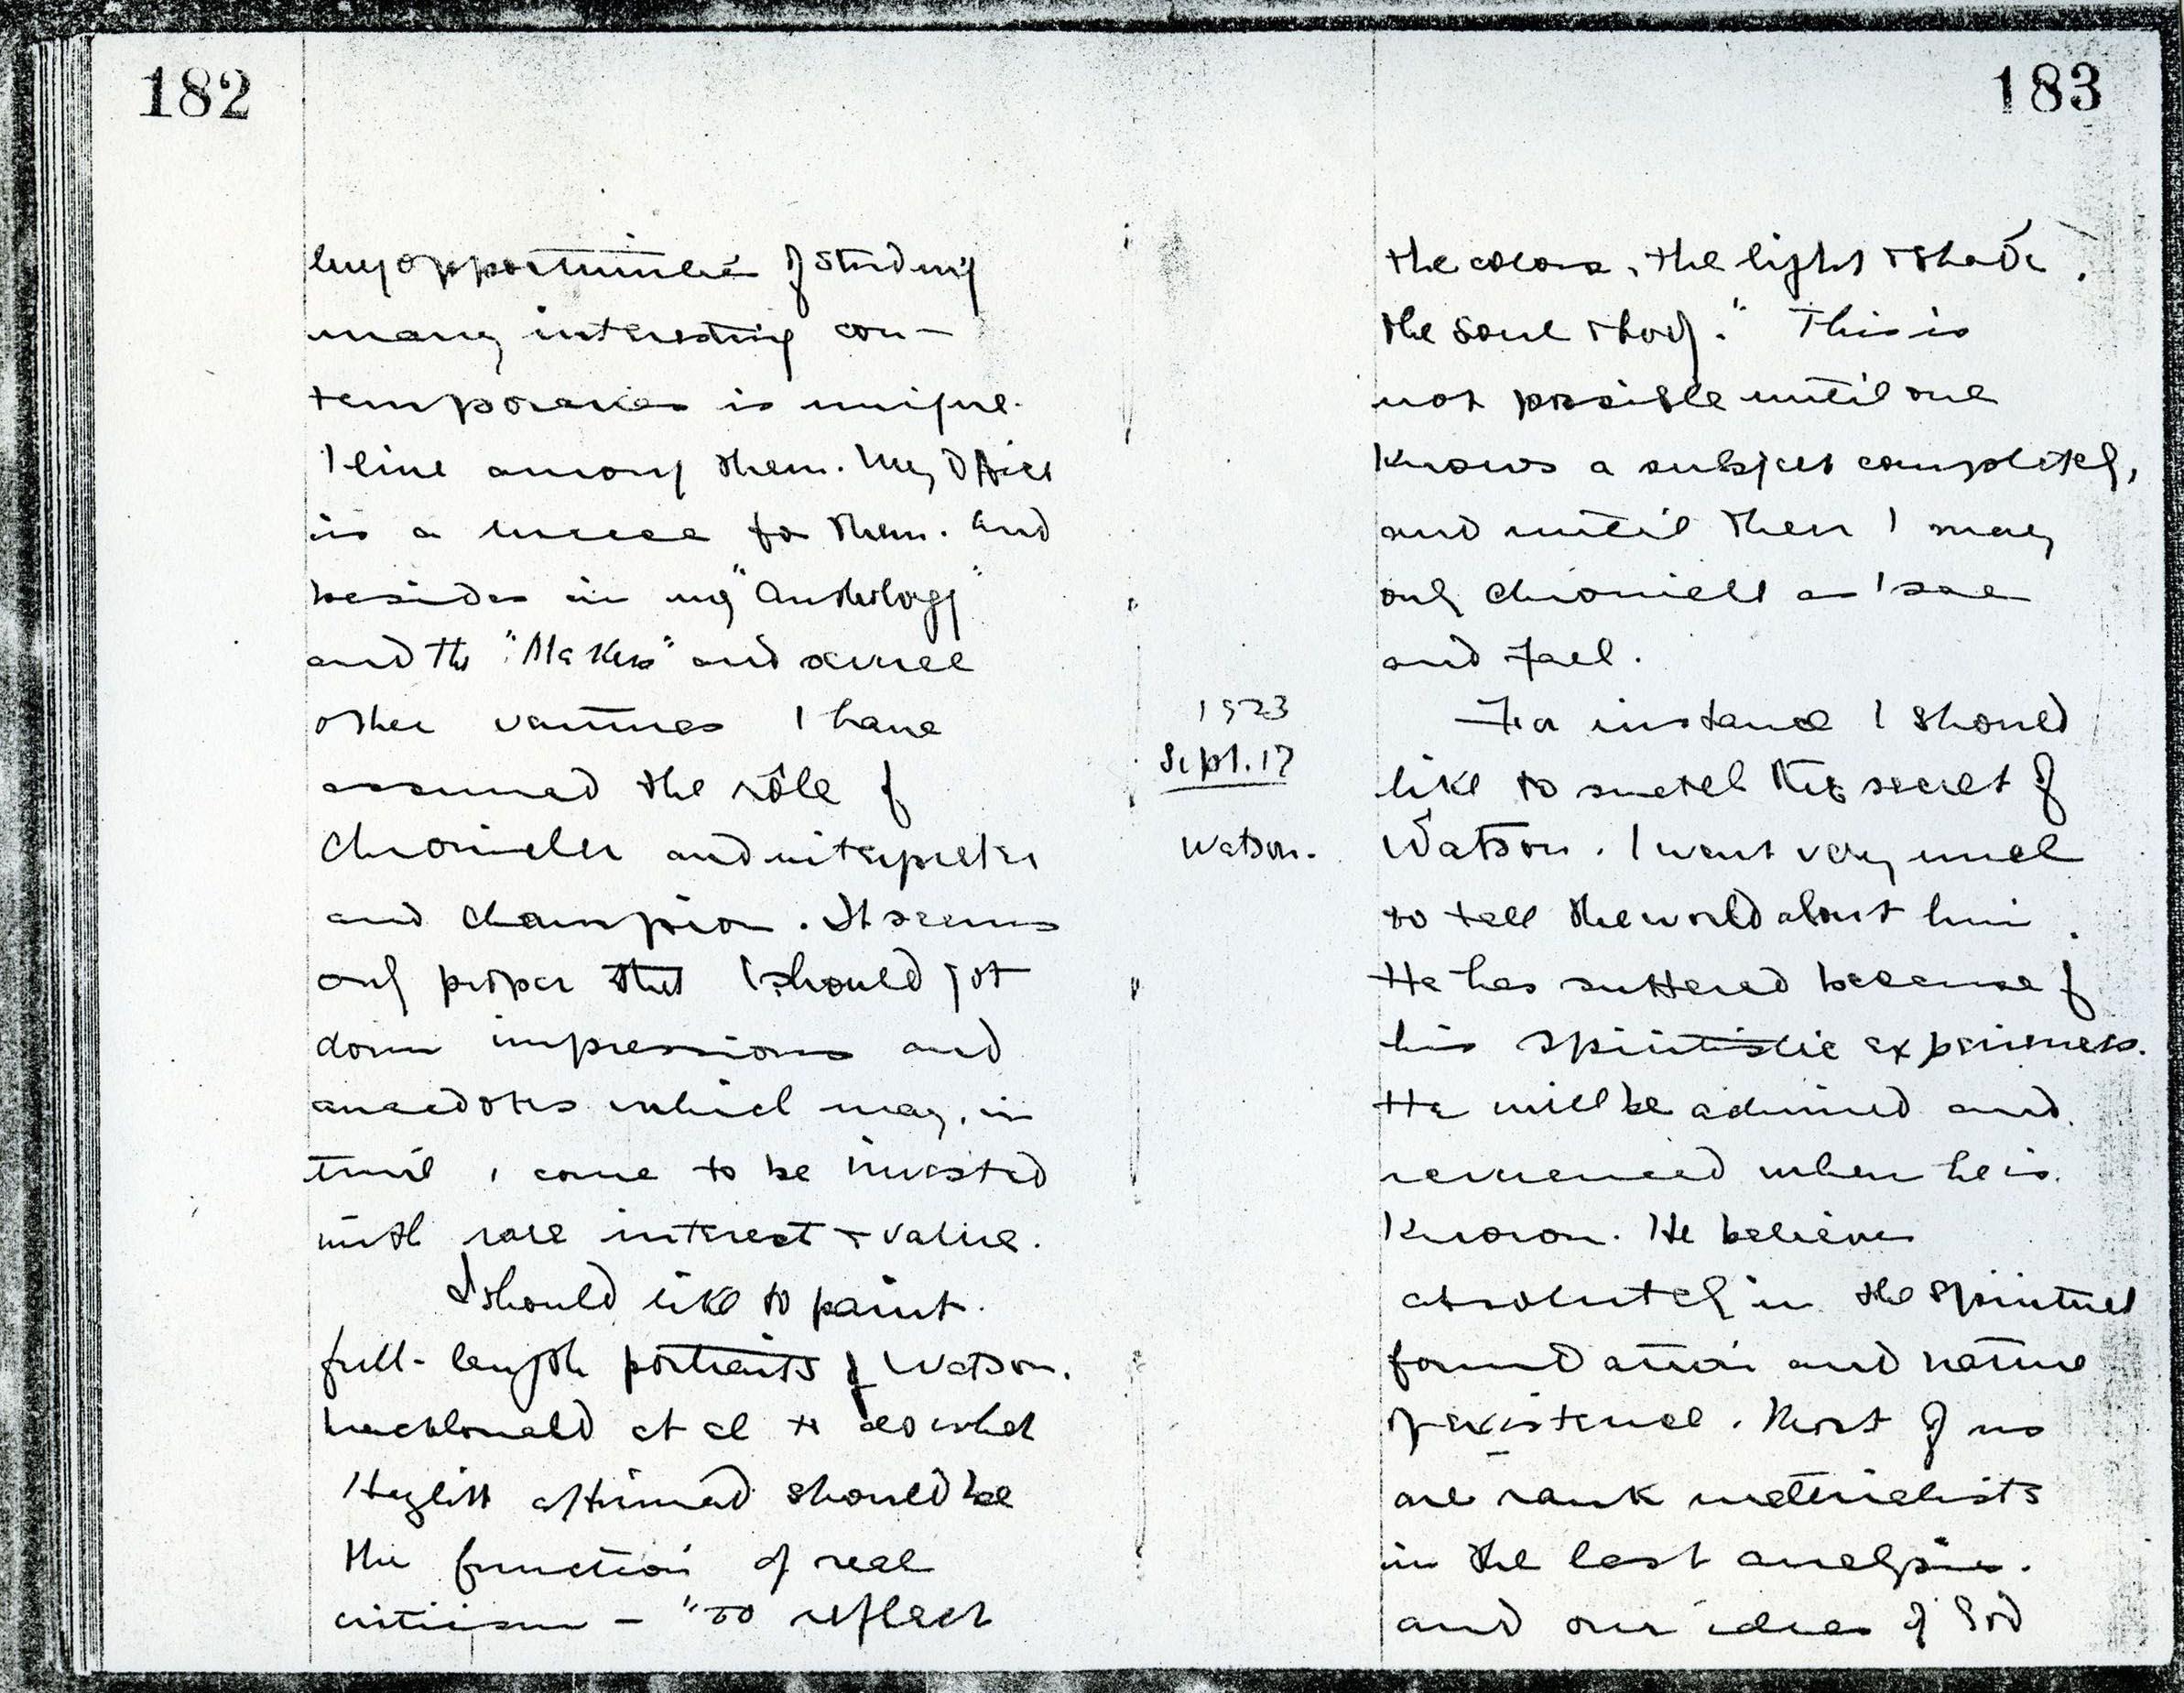 How To Writing An Autobiography Essay Kunstinhetvolkspark Nl